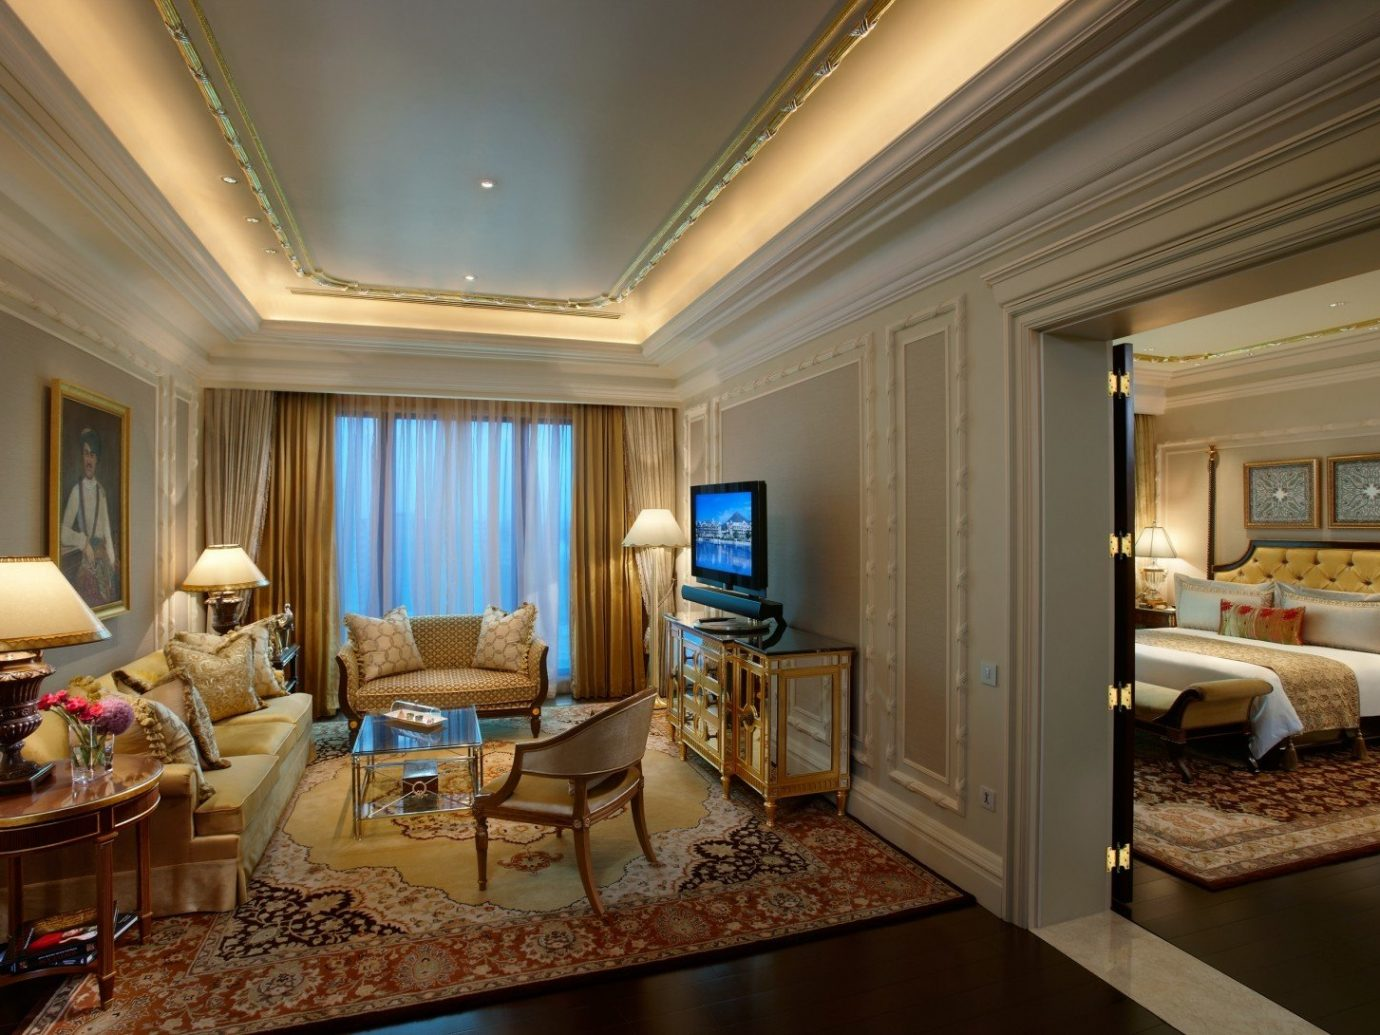 Hotels Luxury Travel indoor wall floor room ceiling Living living room interior design Suite home estate real estate window furniture interior designer area Bedroom